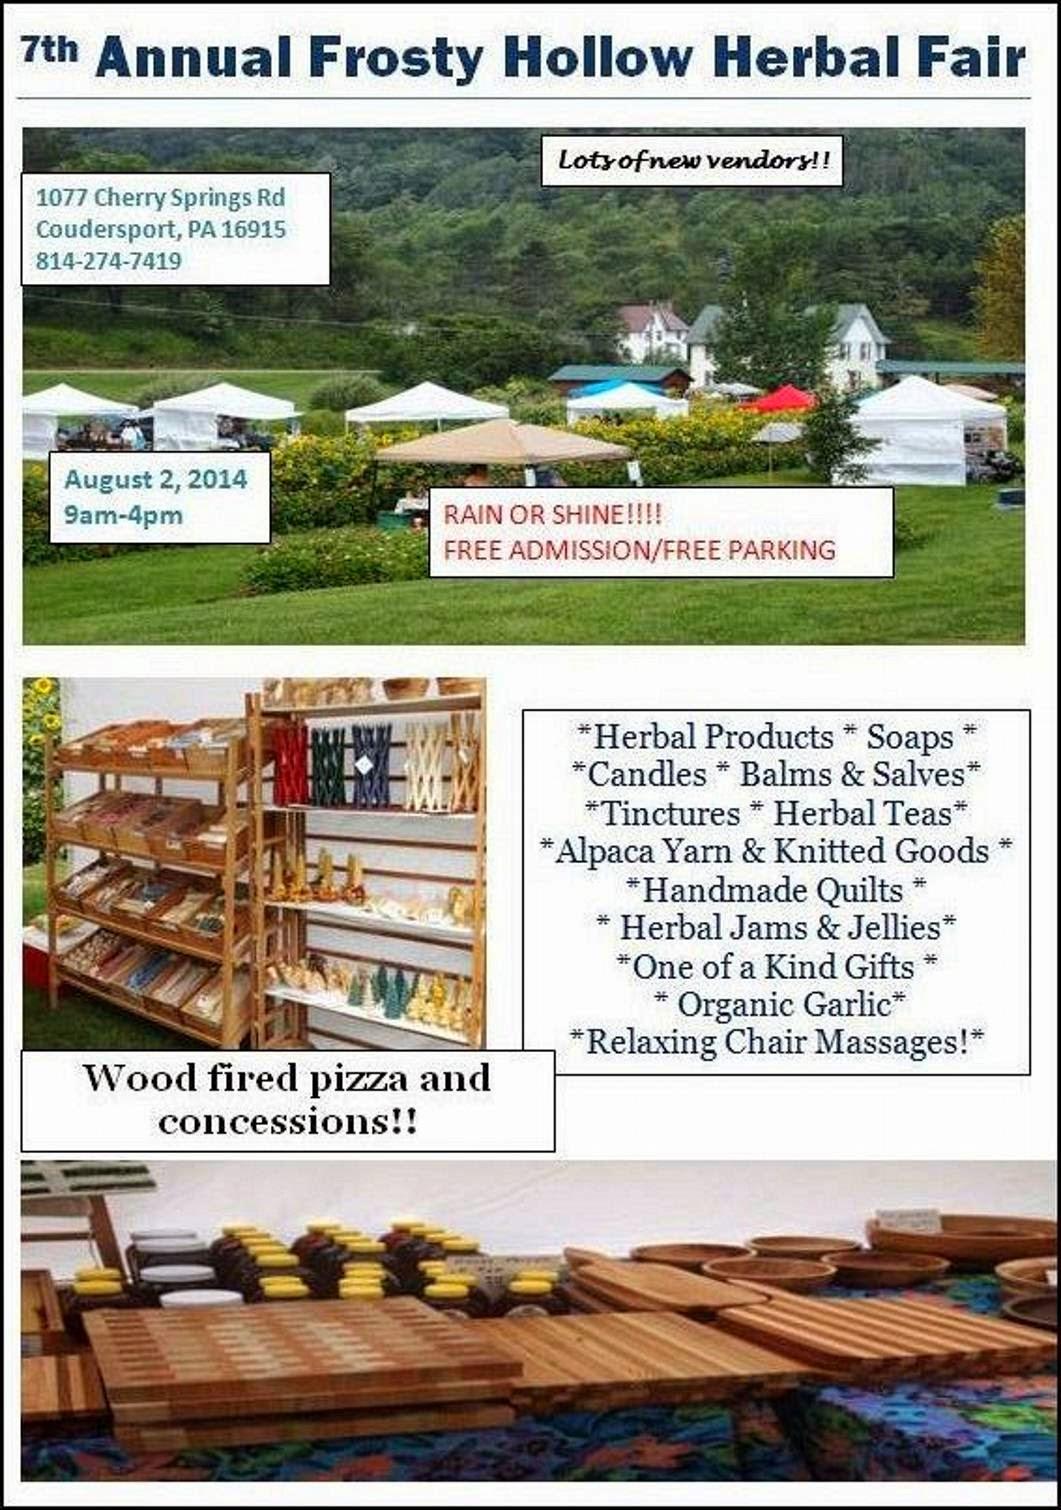 Frosty Hollow Herbal Fair